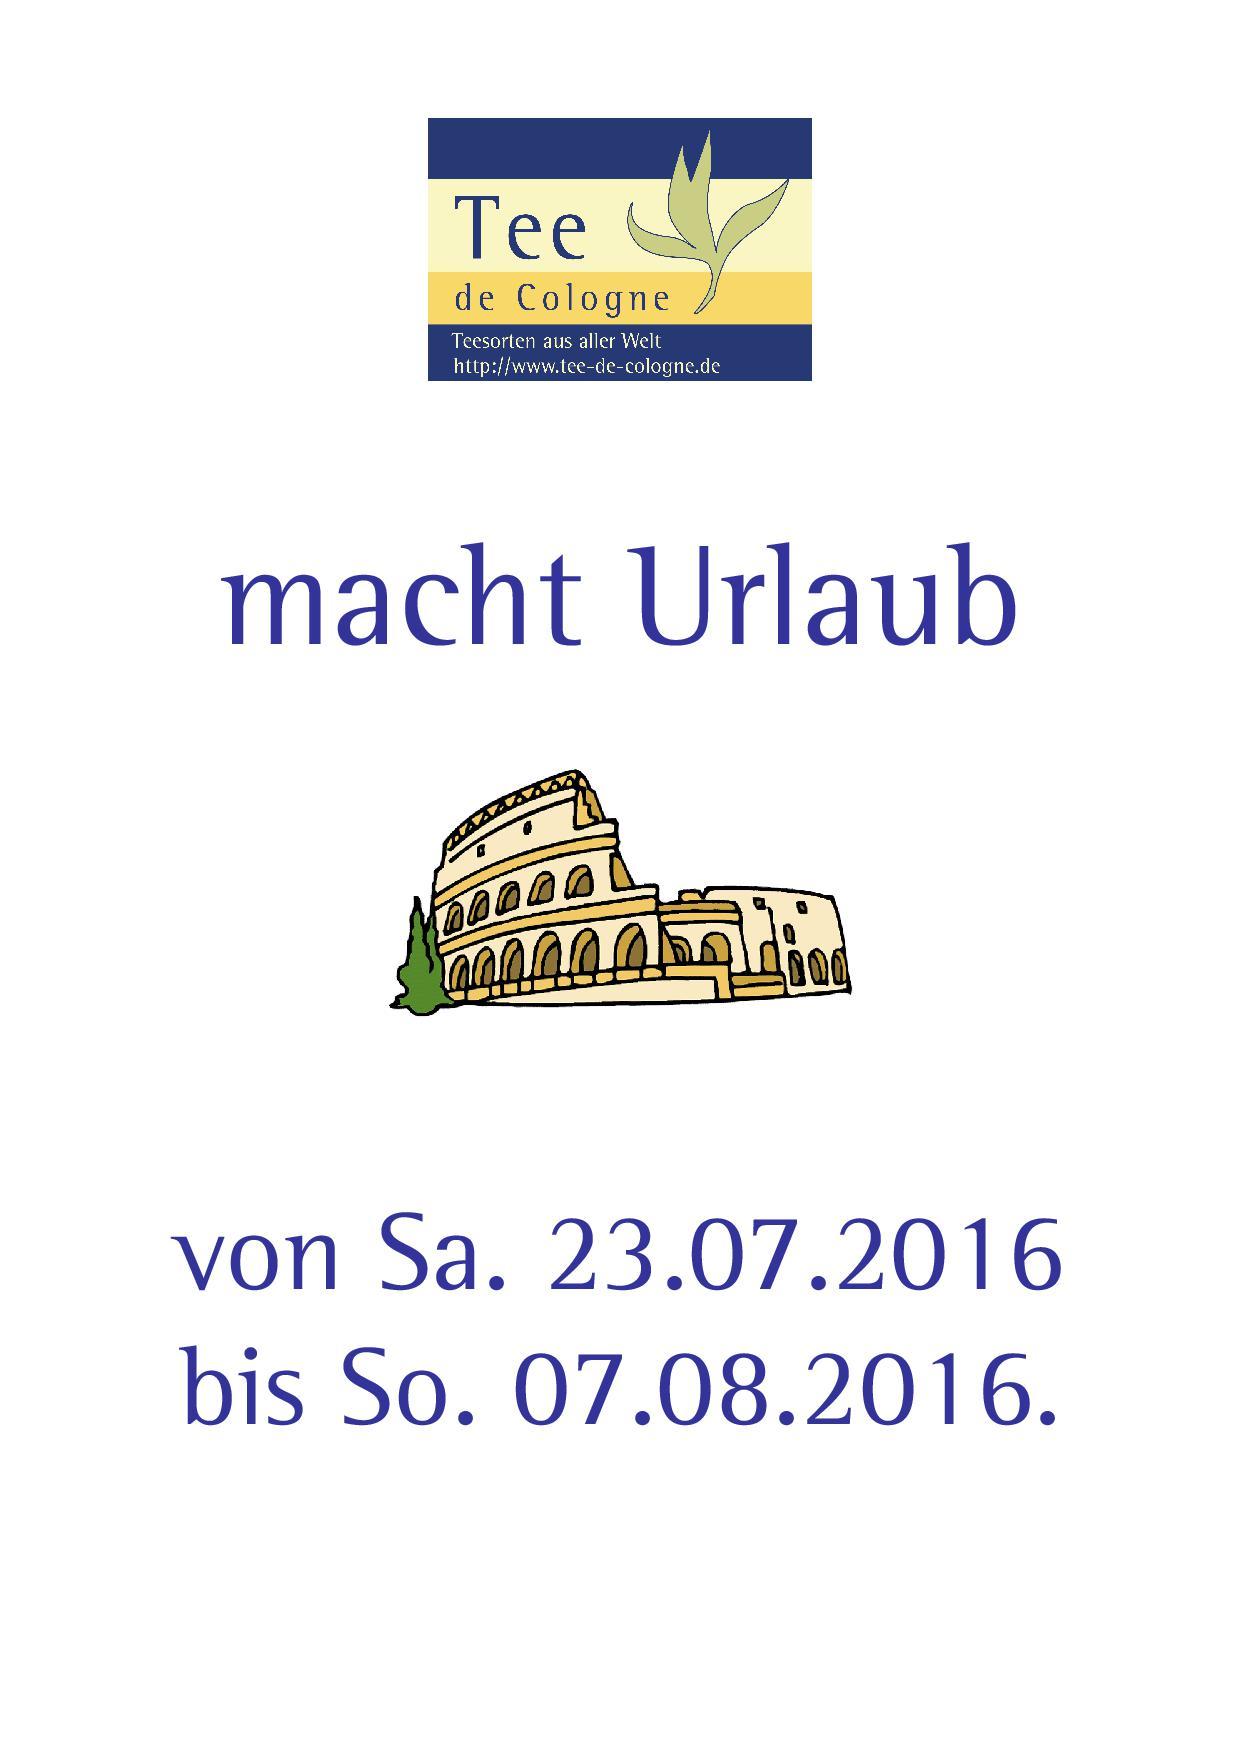 Tee de Cologne Urlaub 2016